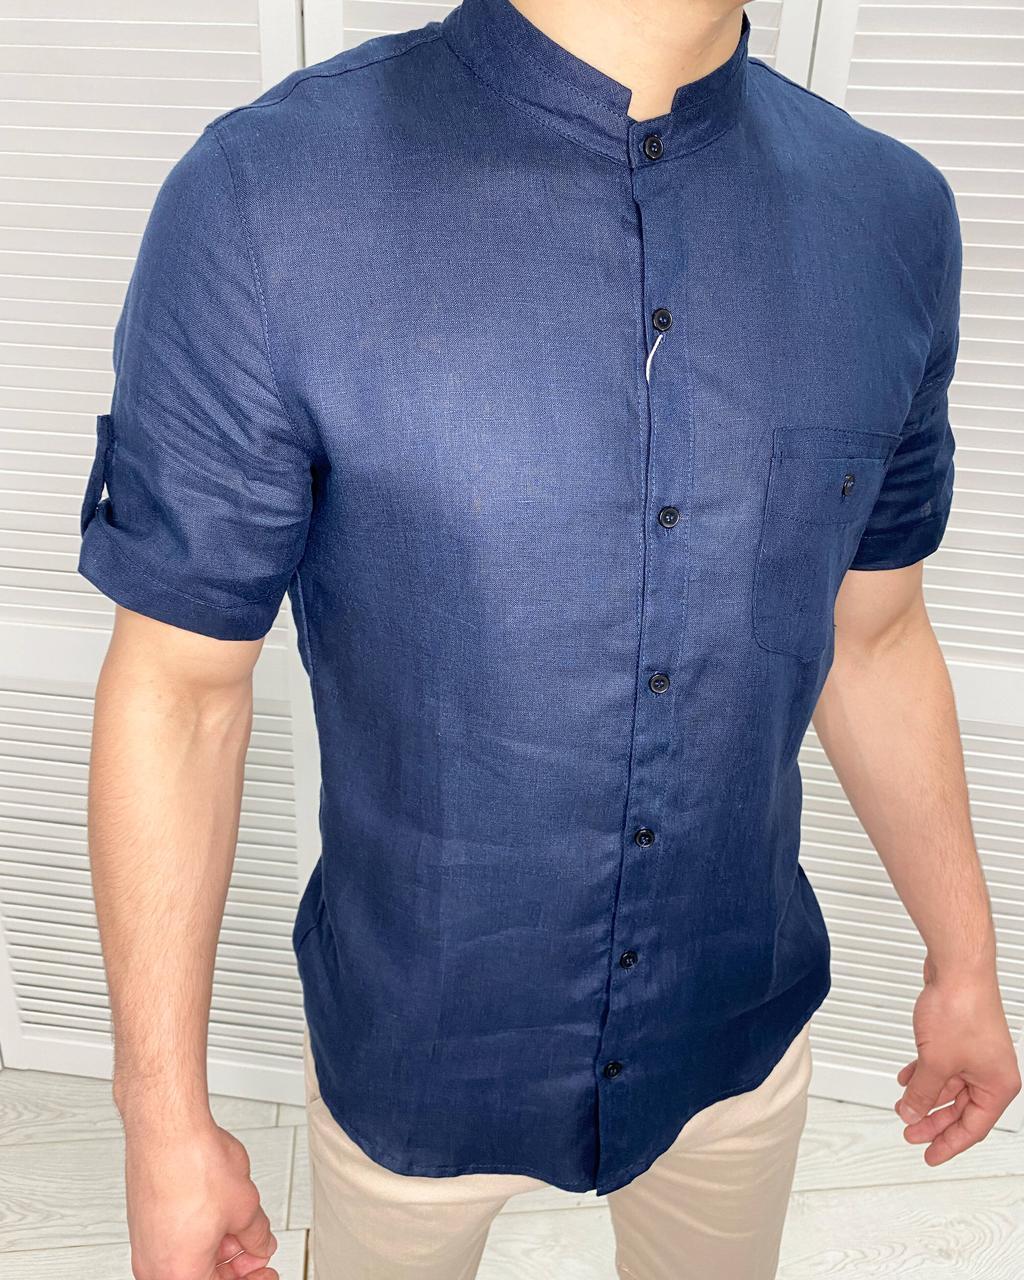 Рубашка мужская с коротким рукавом на лето Ferre Темно-синий 50